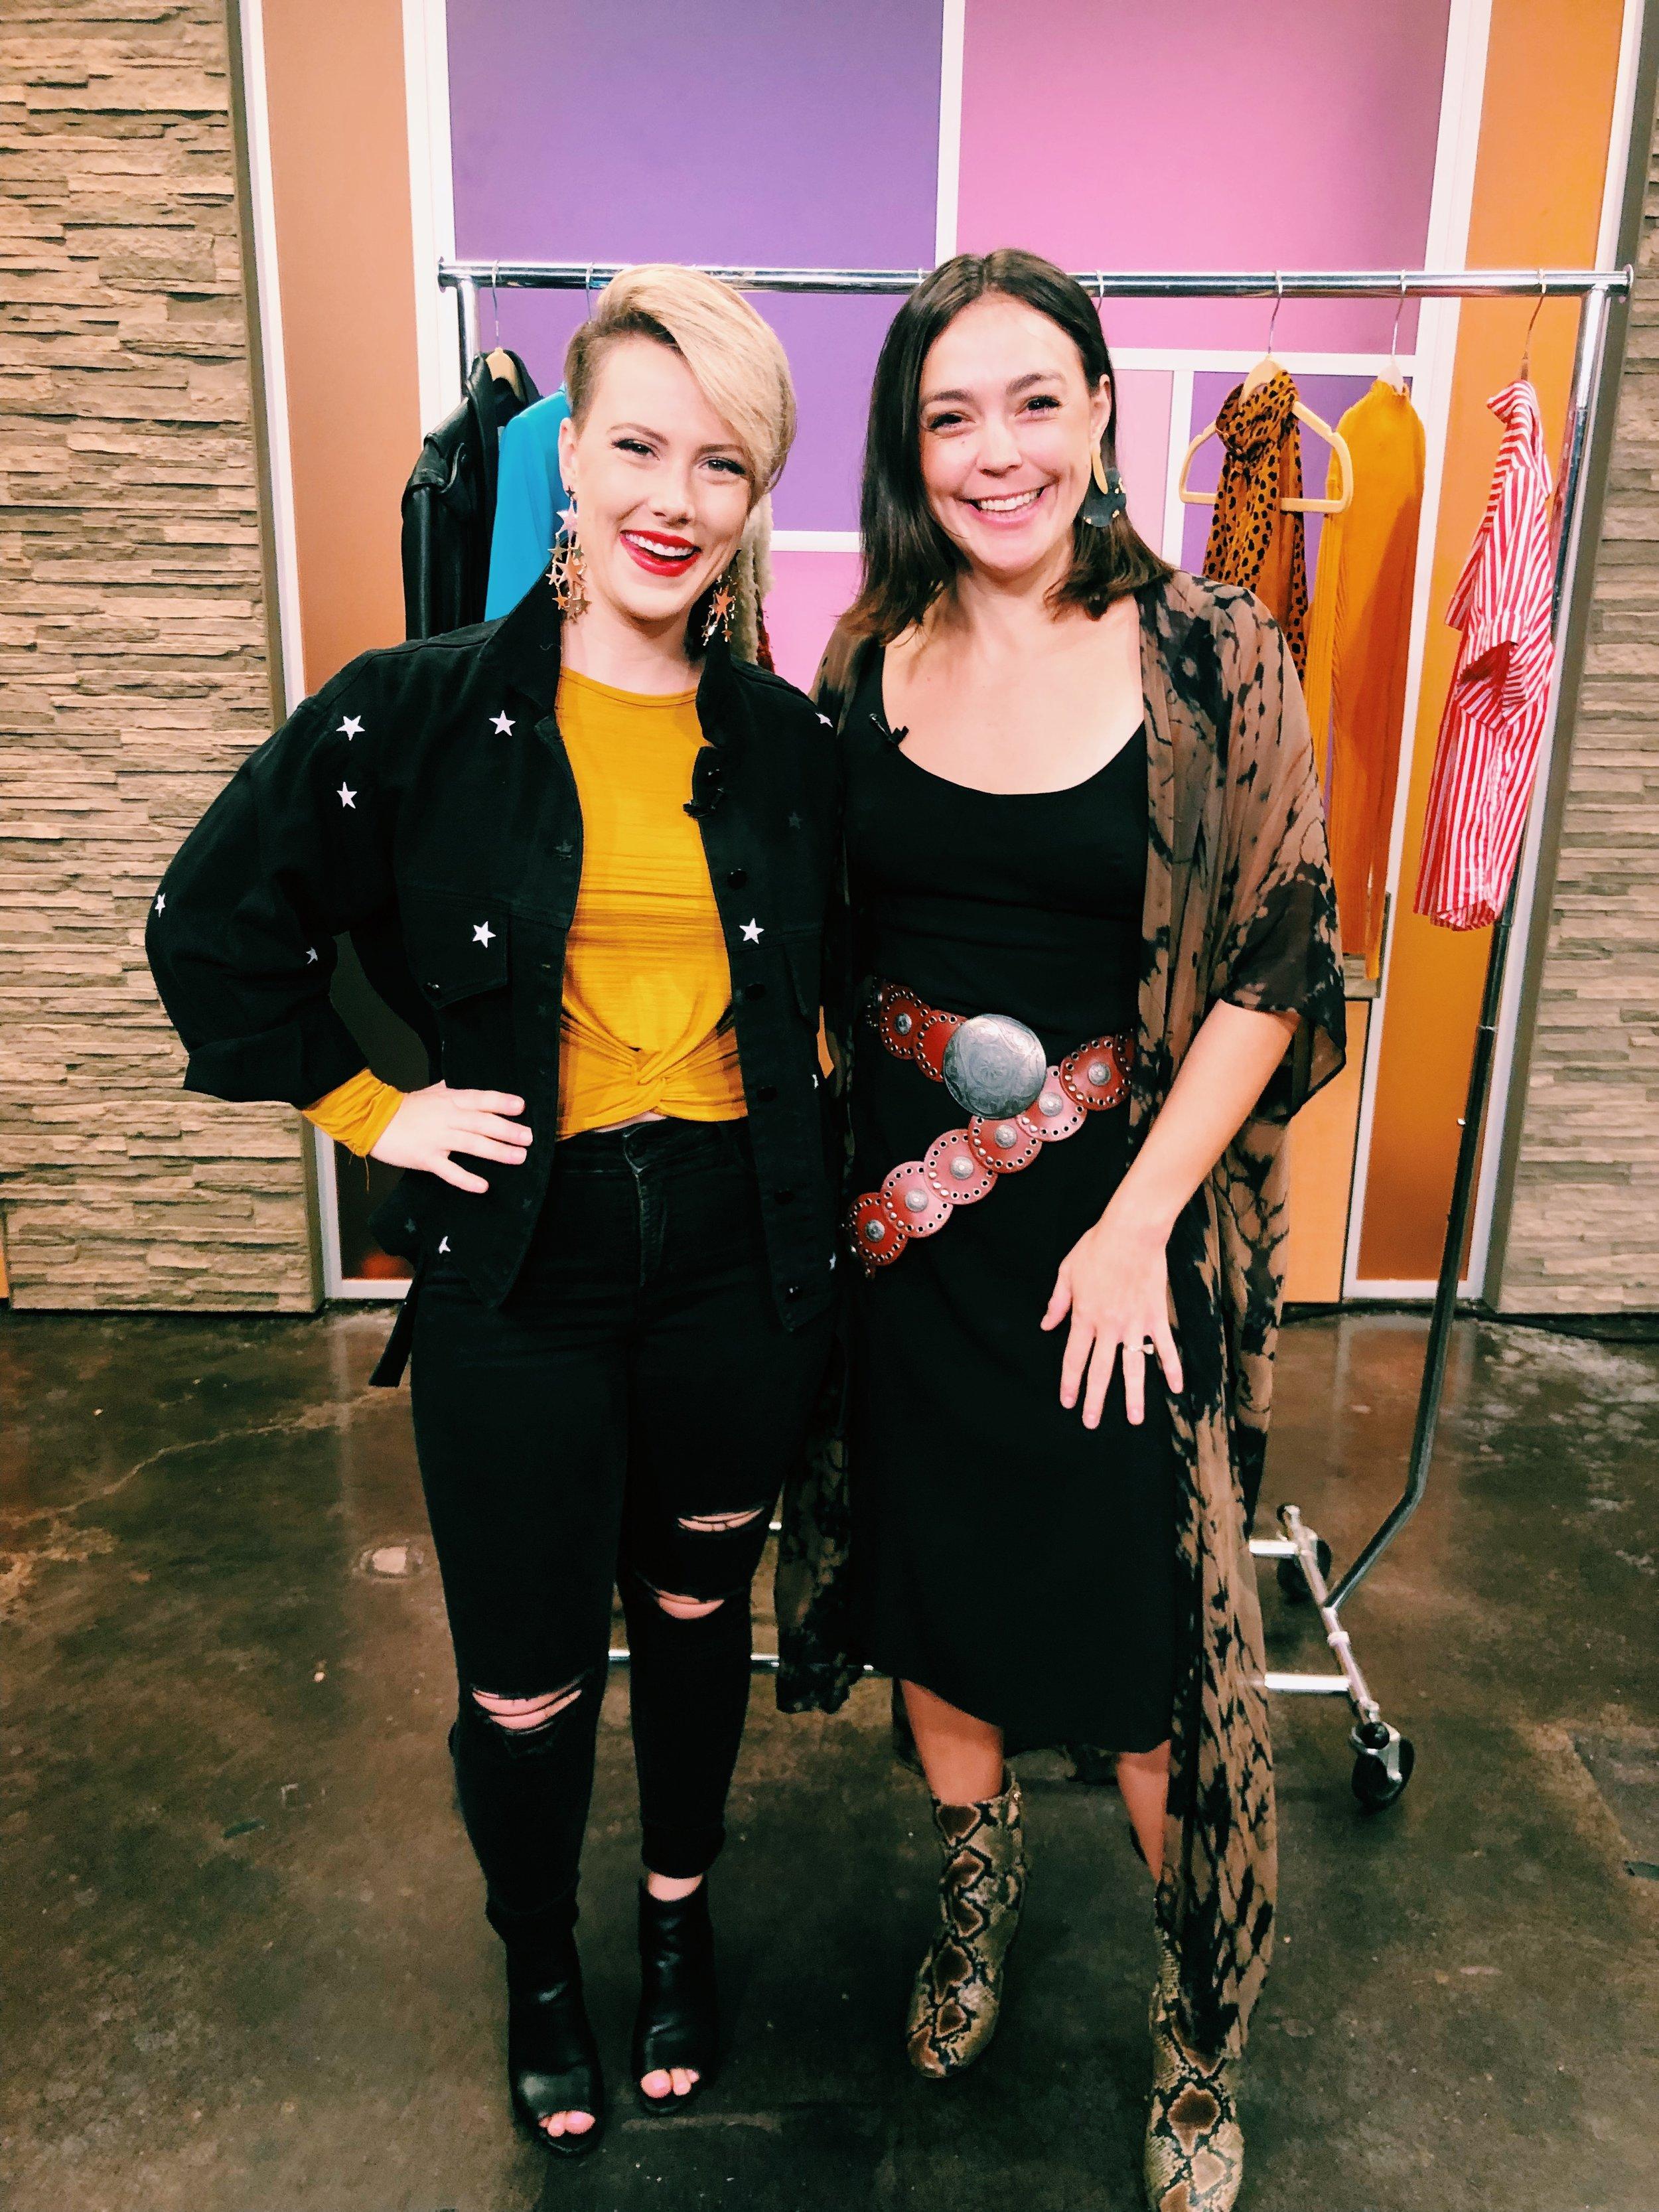 Raquel Greer Gordian visits Studio 512 to talk about closet organization.